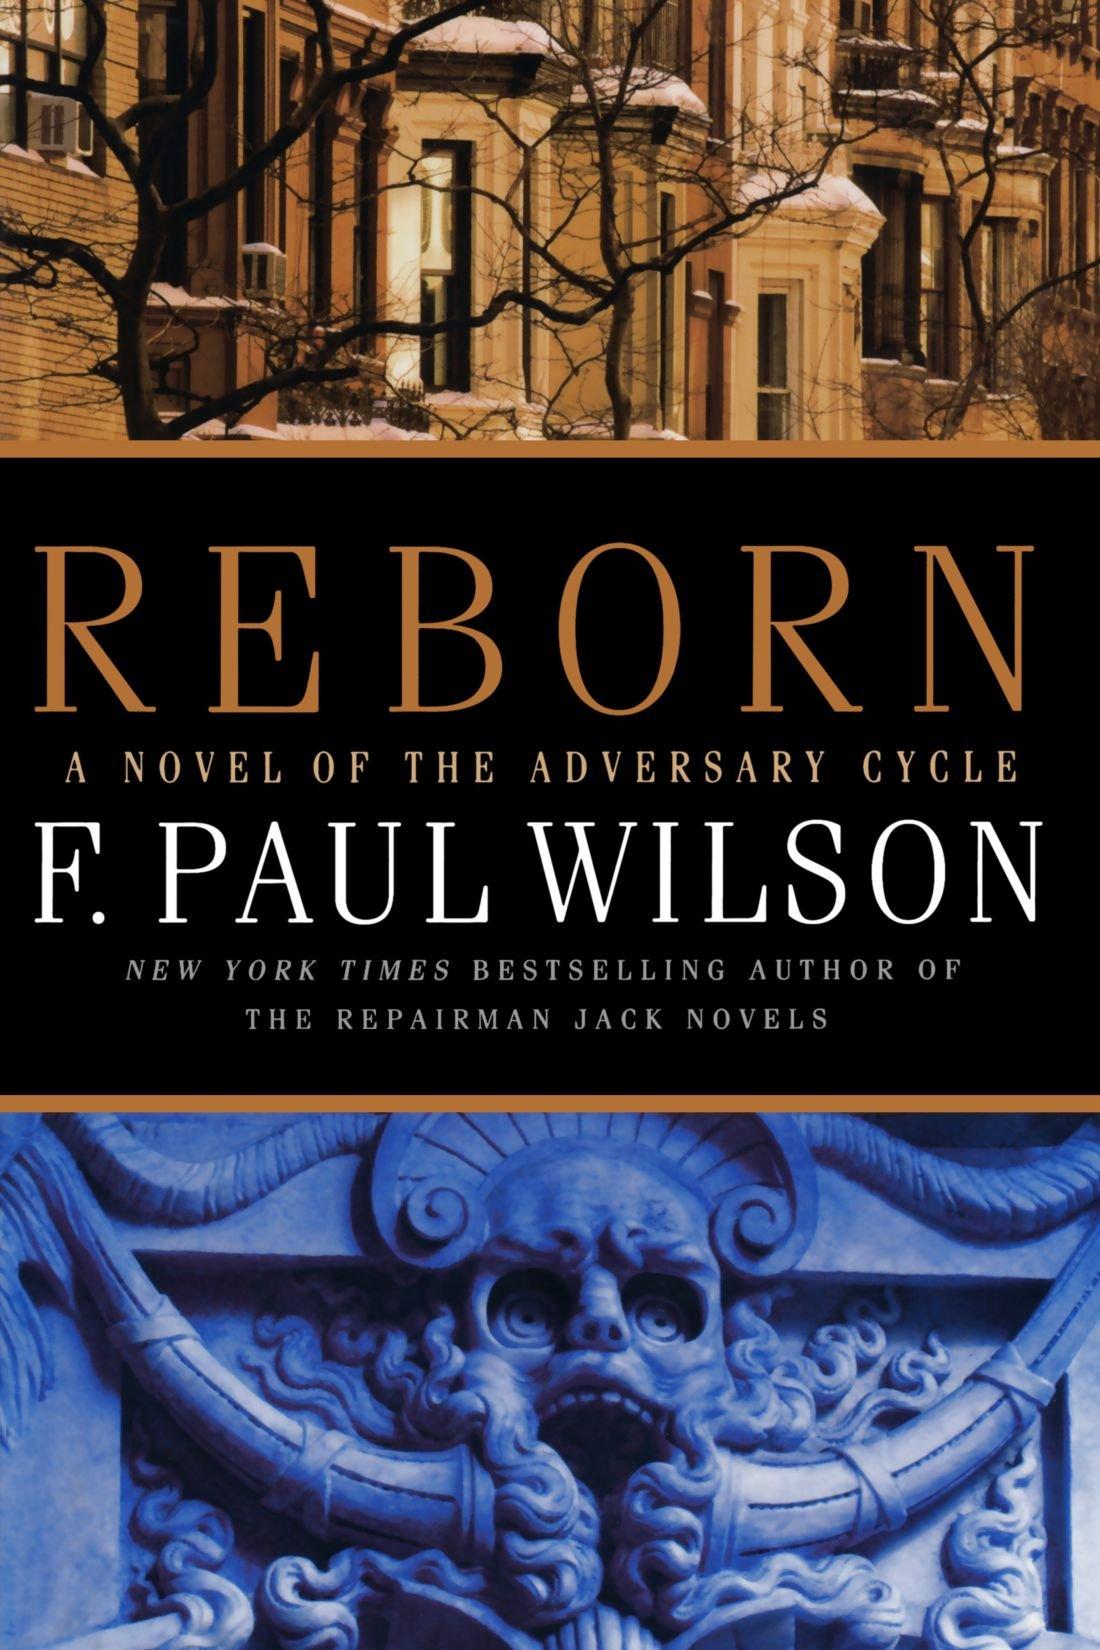 Reborn Book Adversary Cycle Repairman product image